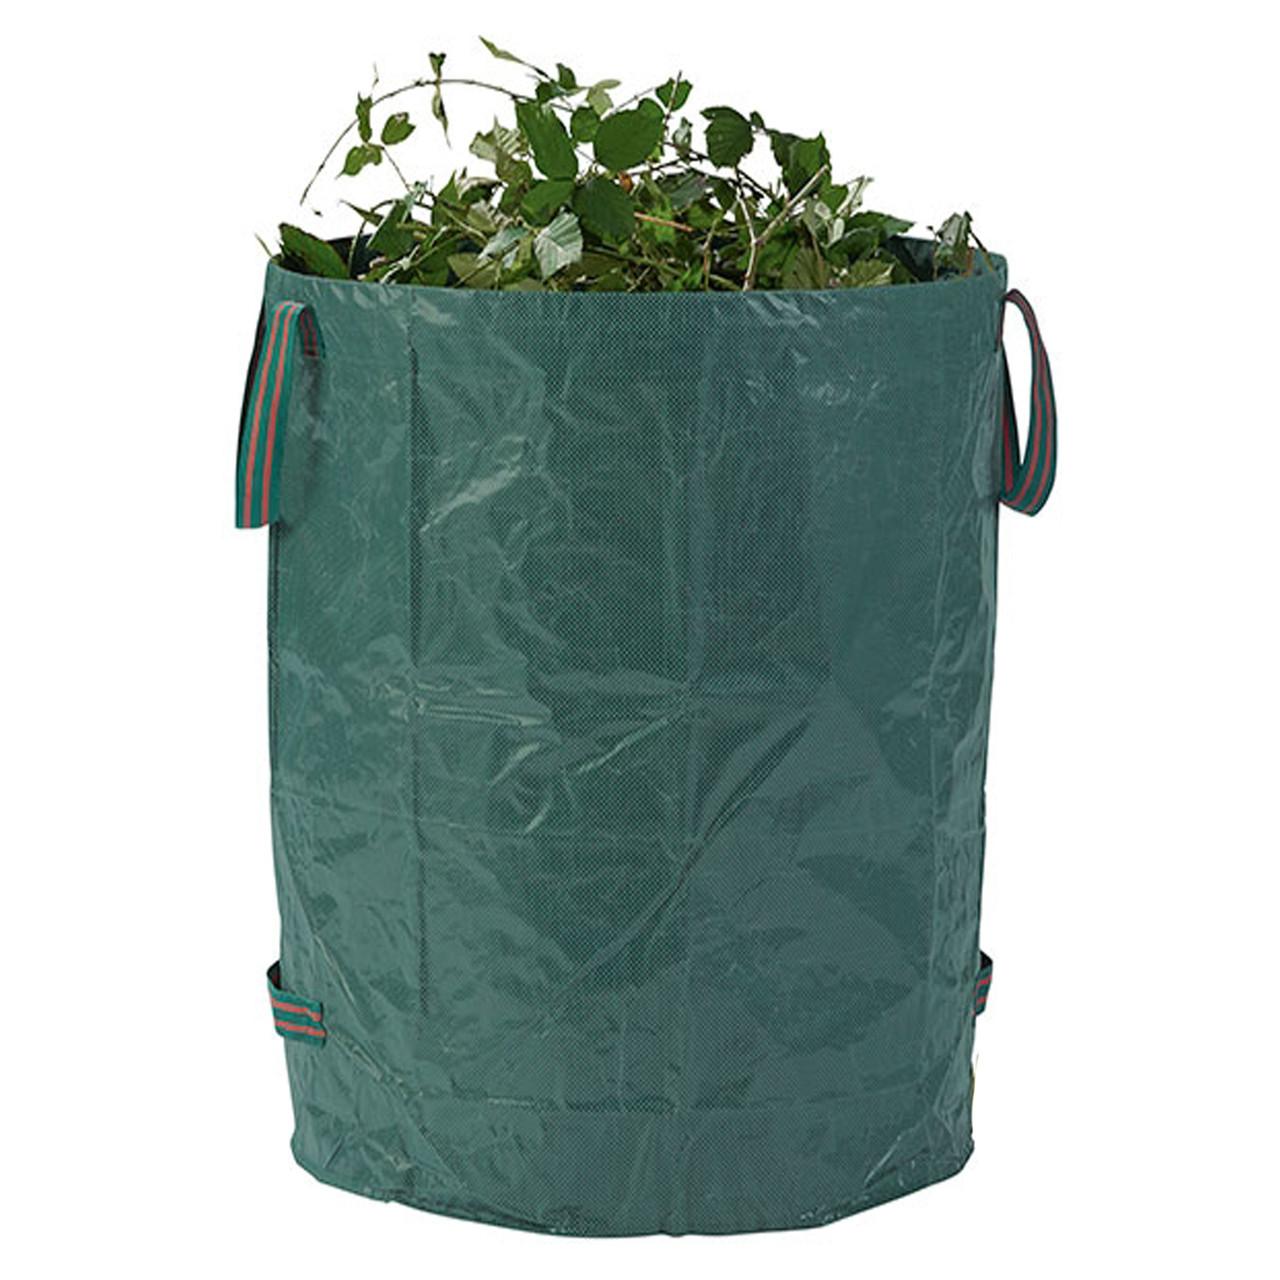 Мешок садовый Florabest, 272 л